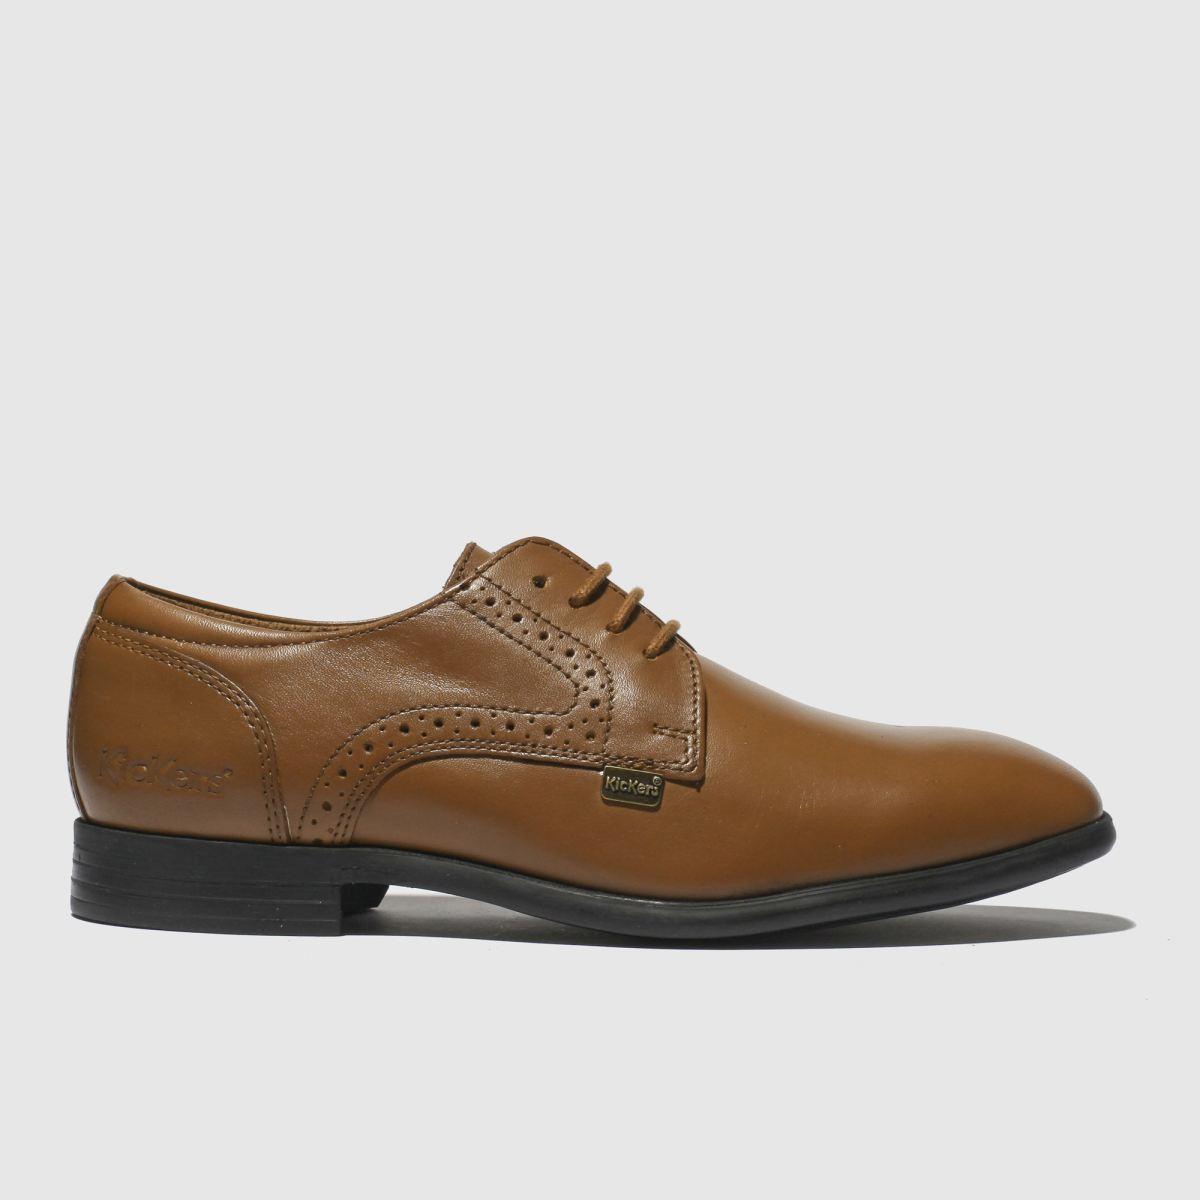 Kickers Tan Jarle Lace Up Shoes Junior